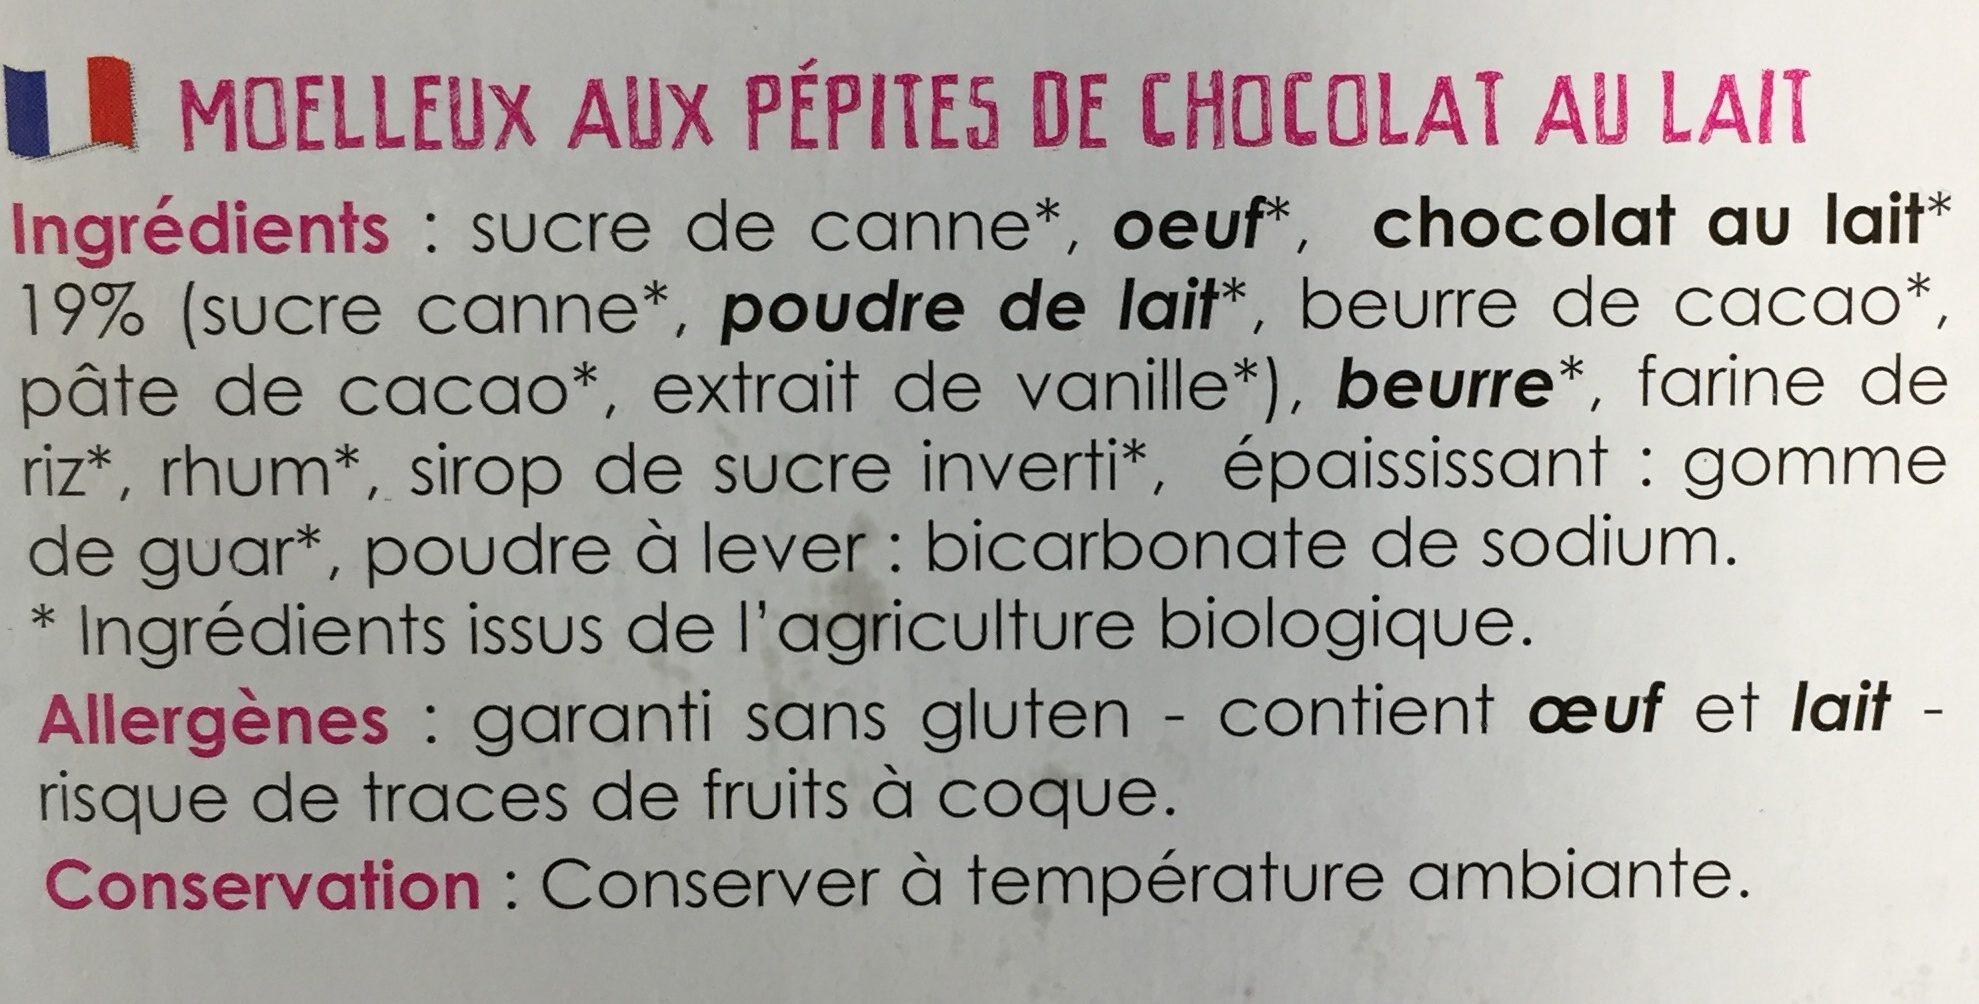 Moelleux pepites - Ingrédients - fr